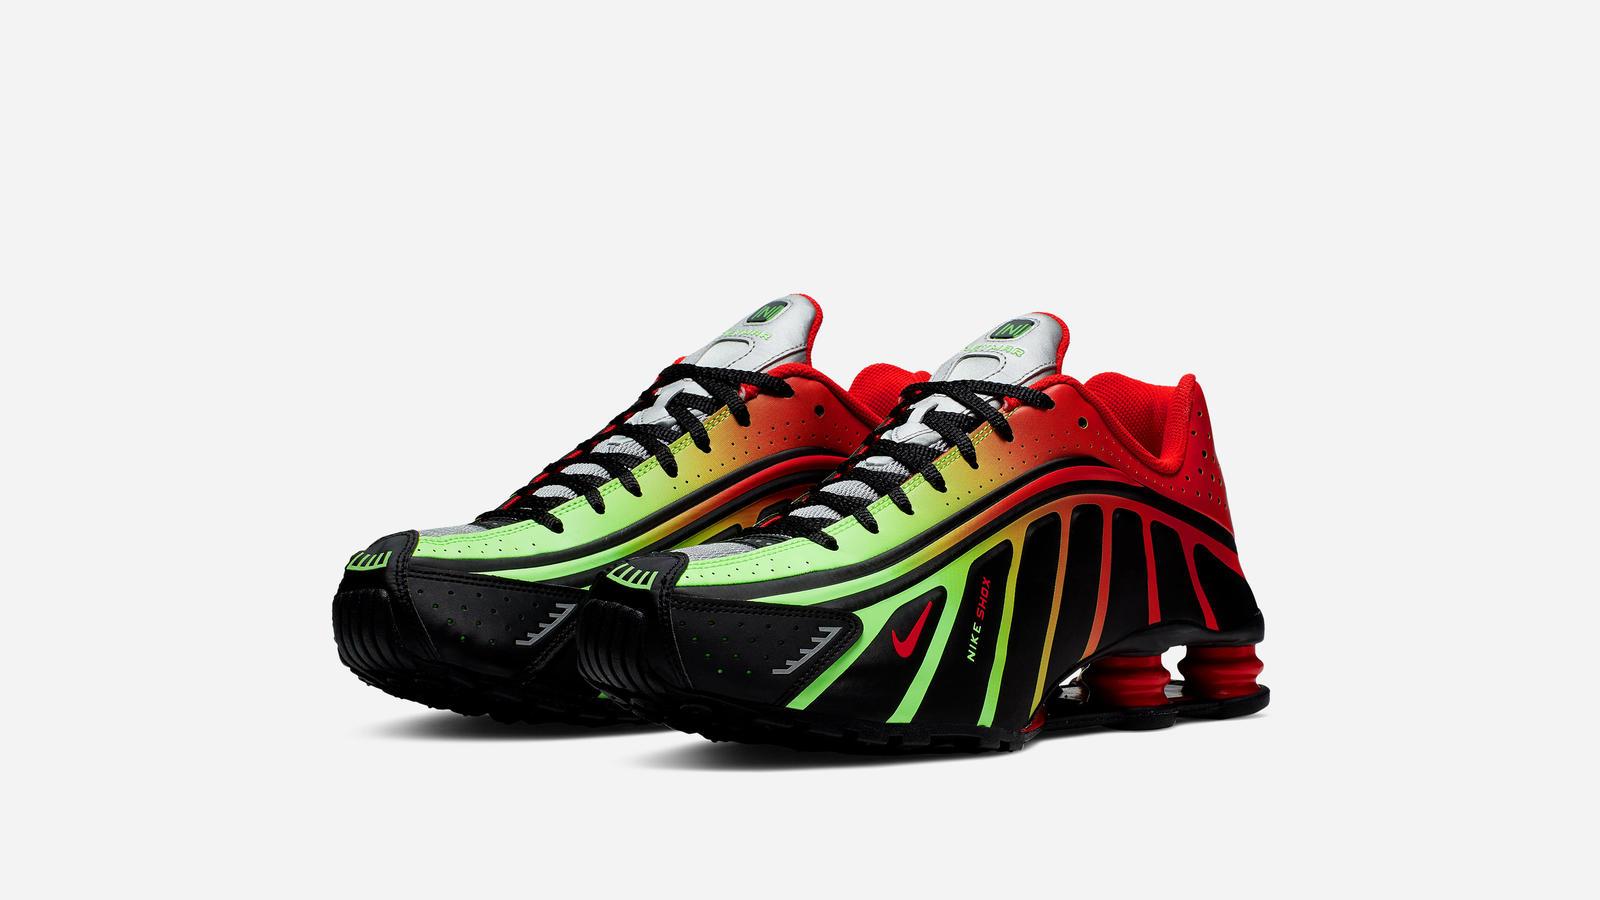 Nike Shox R4 Neymar JR Official Release Date - Nike News